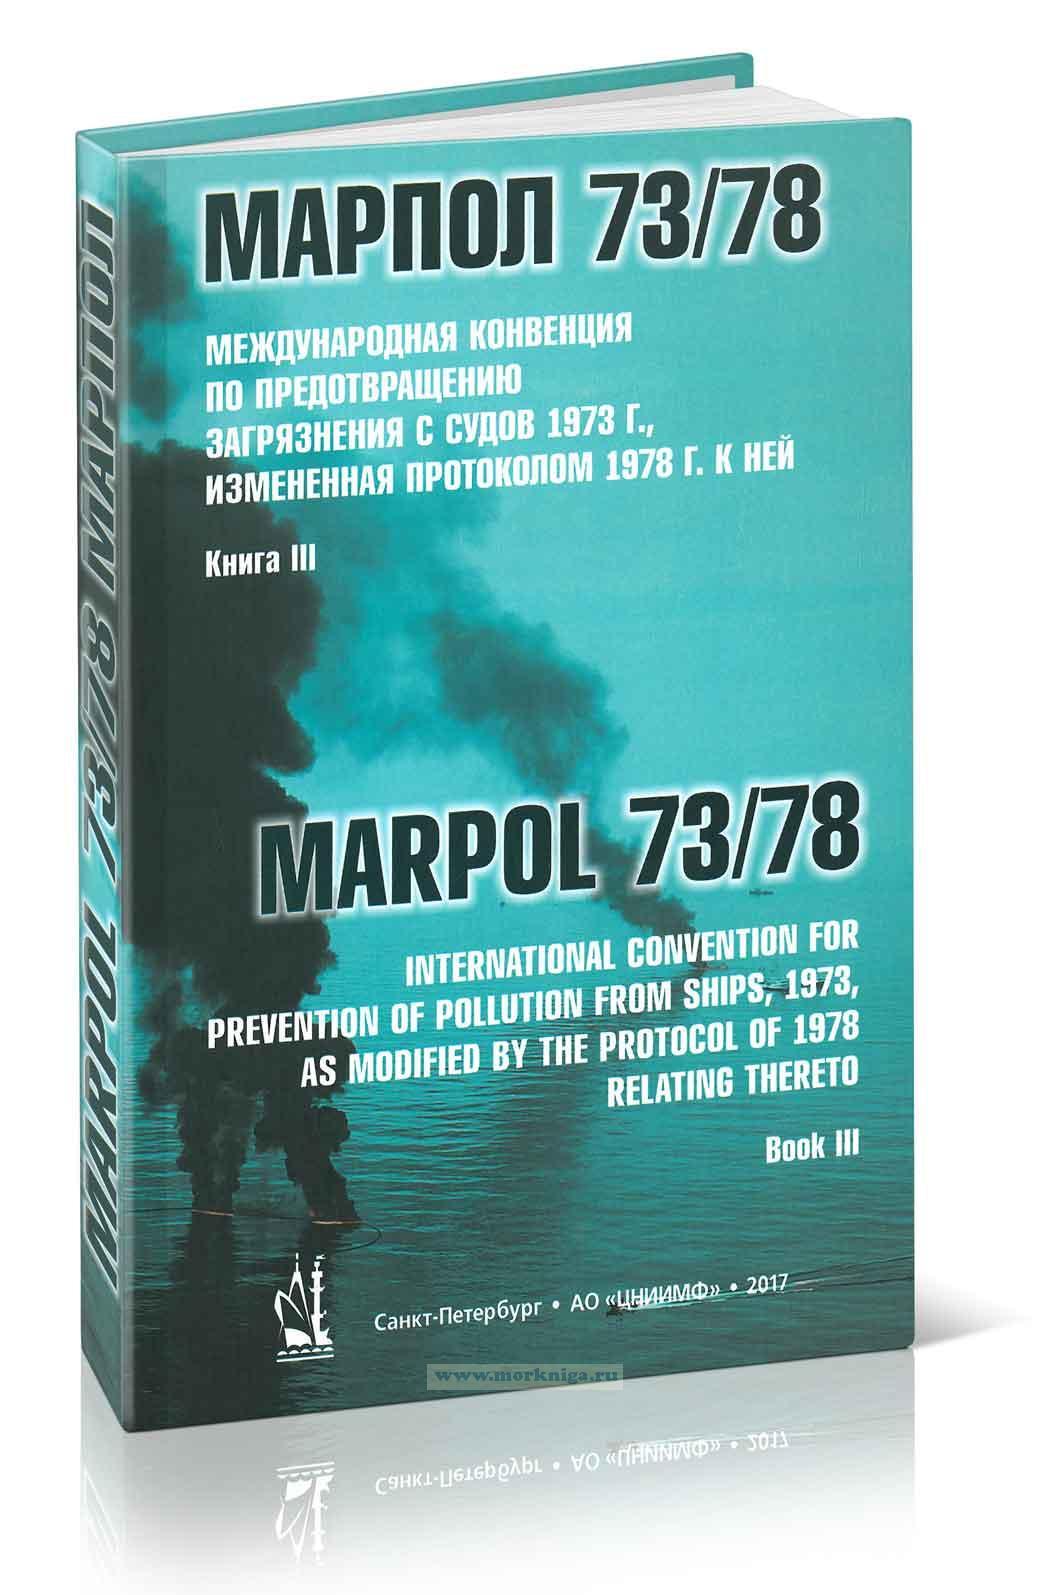 Международная Конвенция по предотвращению загрязнения с судов (МАРПОЛ) Книга III. International Convention for Prevention of Pollution from Ships (MARPOL), Book III